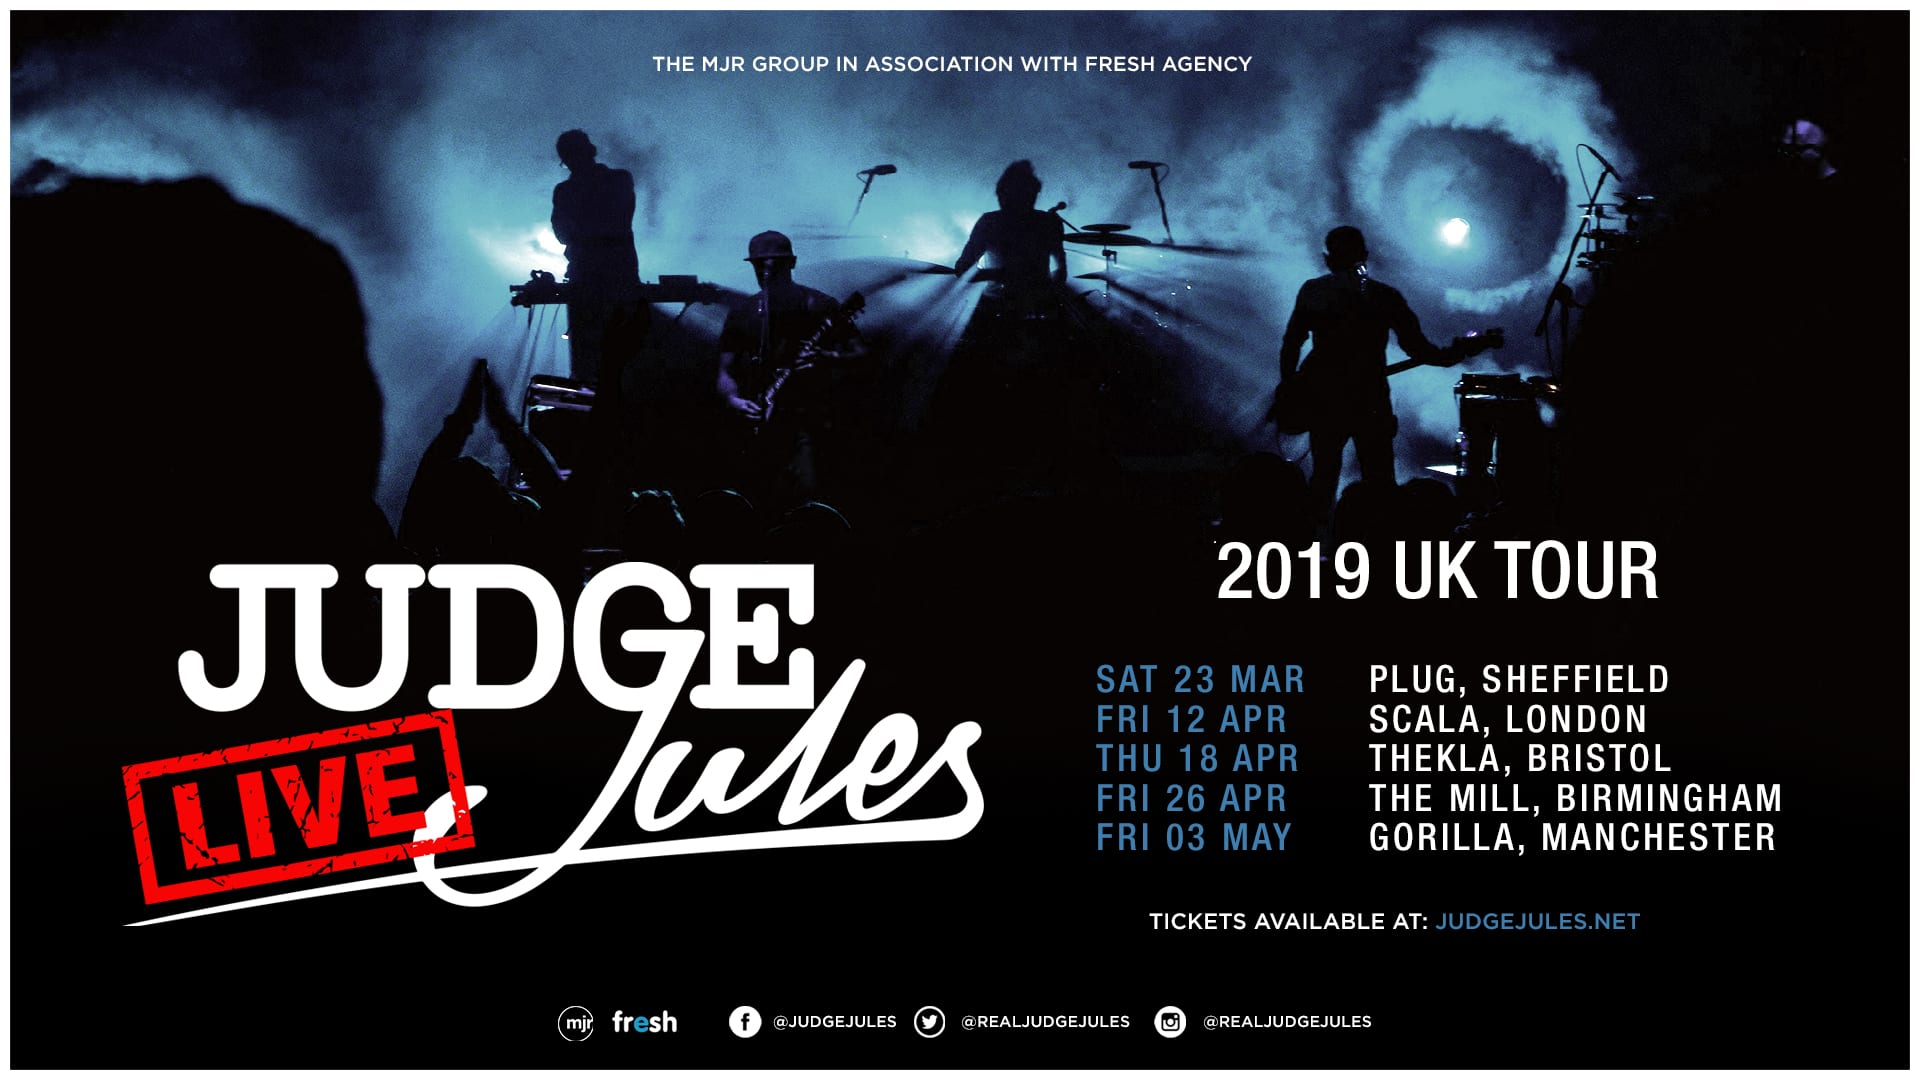 judge-jules-live-tour-header.jpg